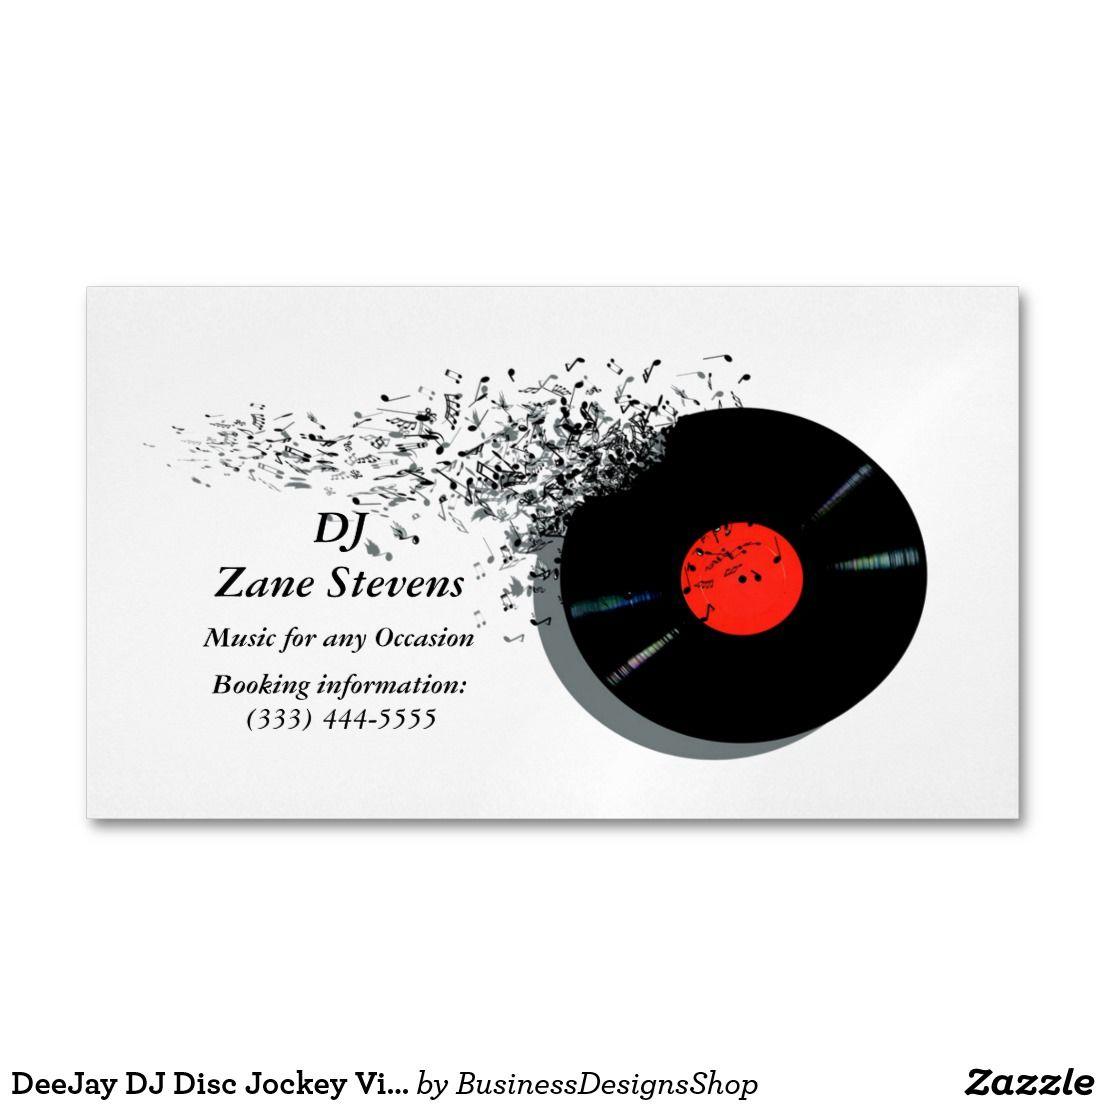 Deejay Dj Disc Jockey Vinyl Record